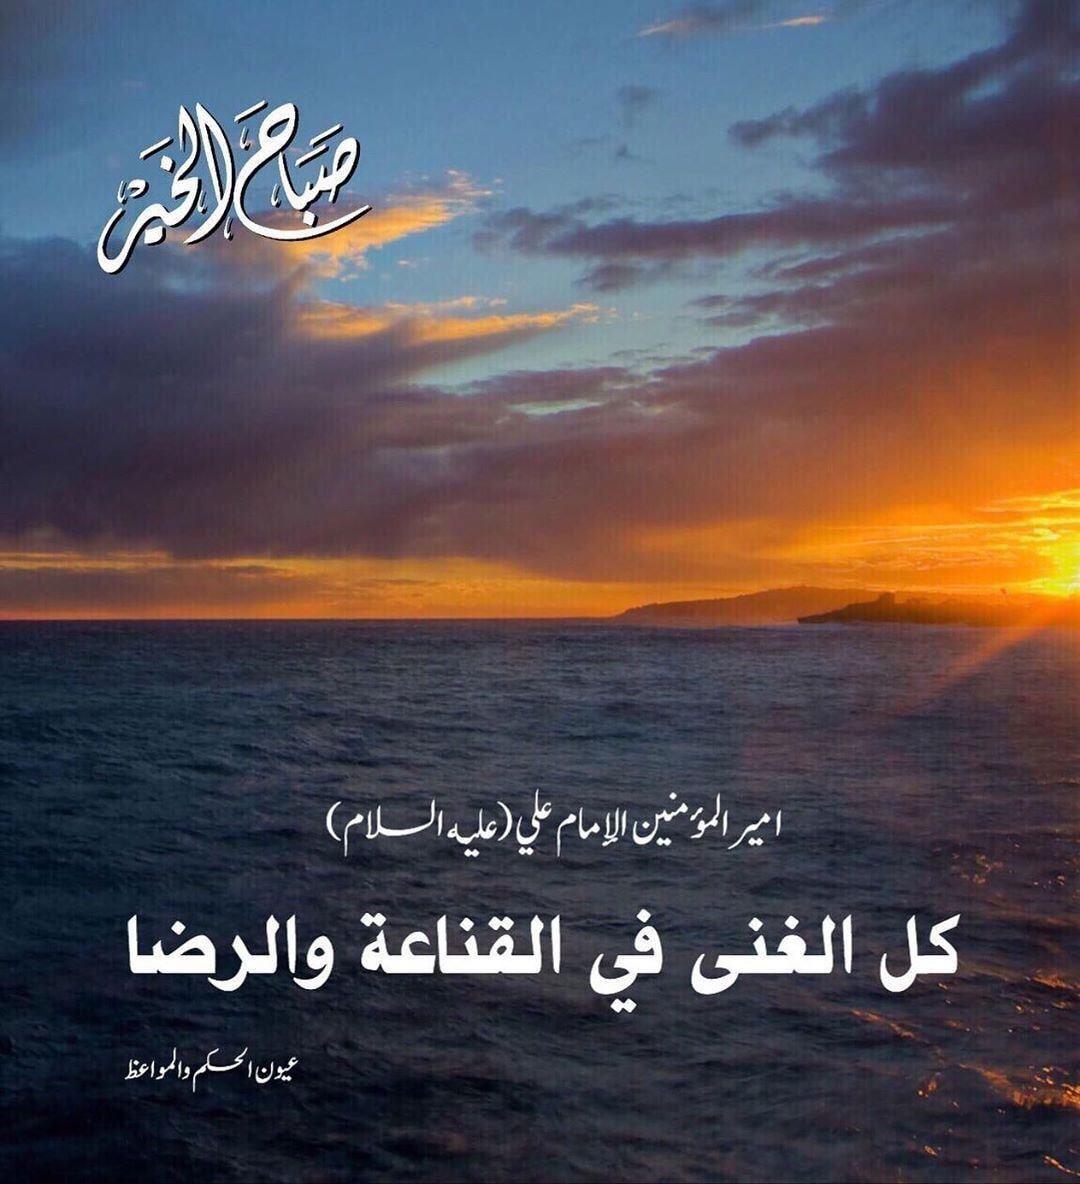 Pin By Aldahan On احاديث ا هل الب يت ص Imam Ali Quotes Ali Quotes Lockscreen Screenshot